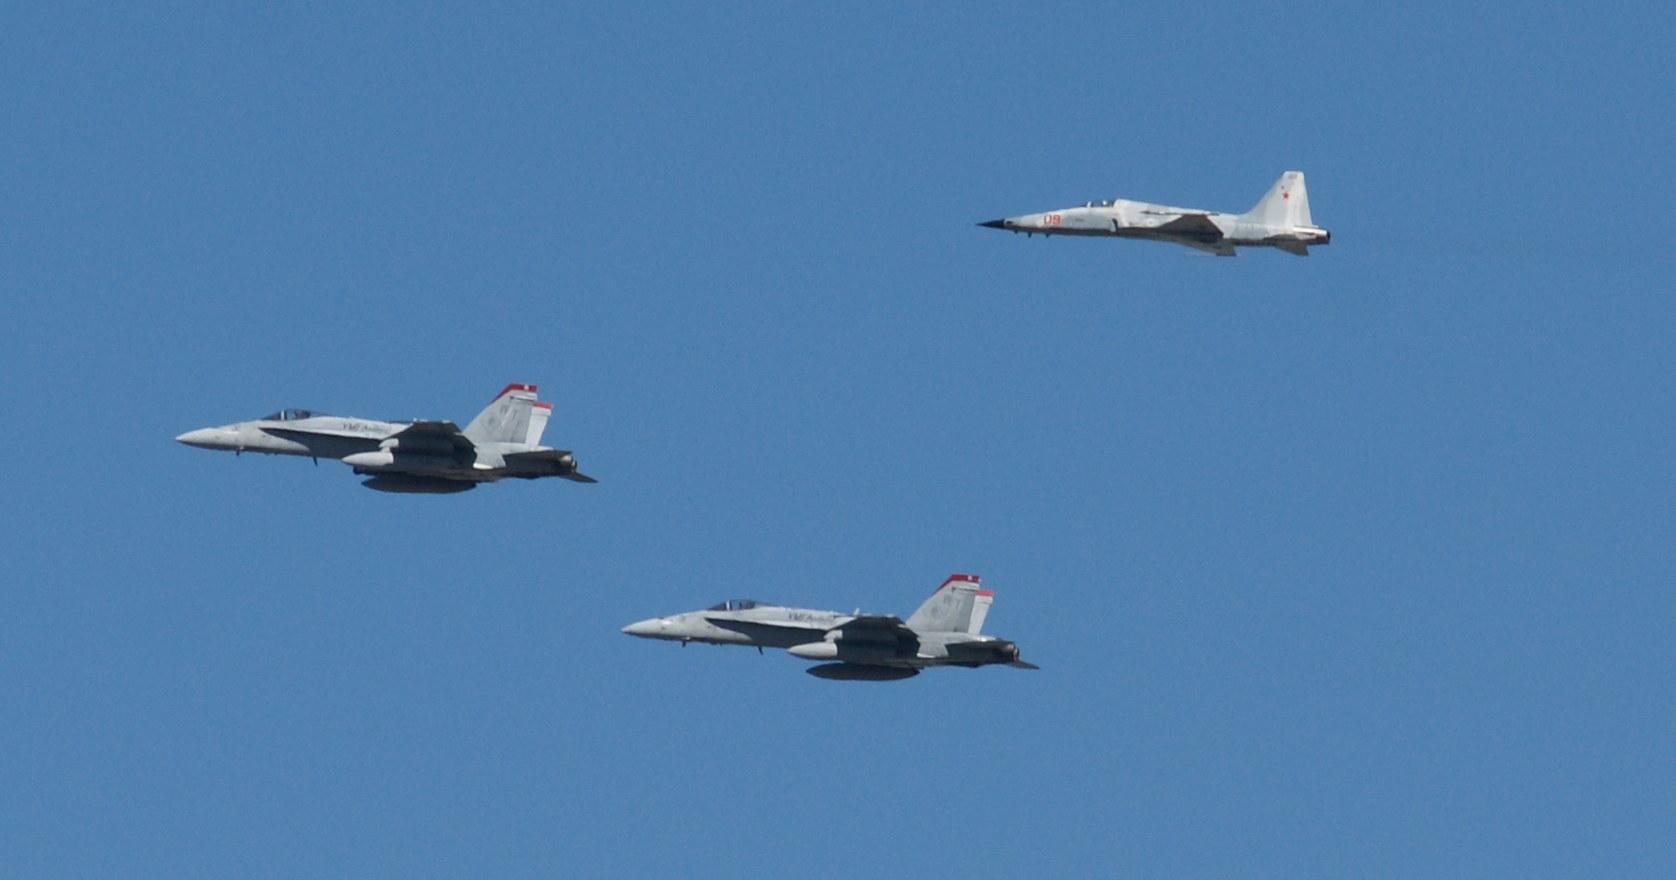 McDonnell Douglas F/A-18 Hornet and Northrop F-5